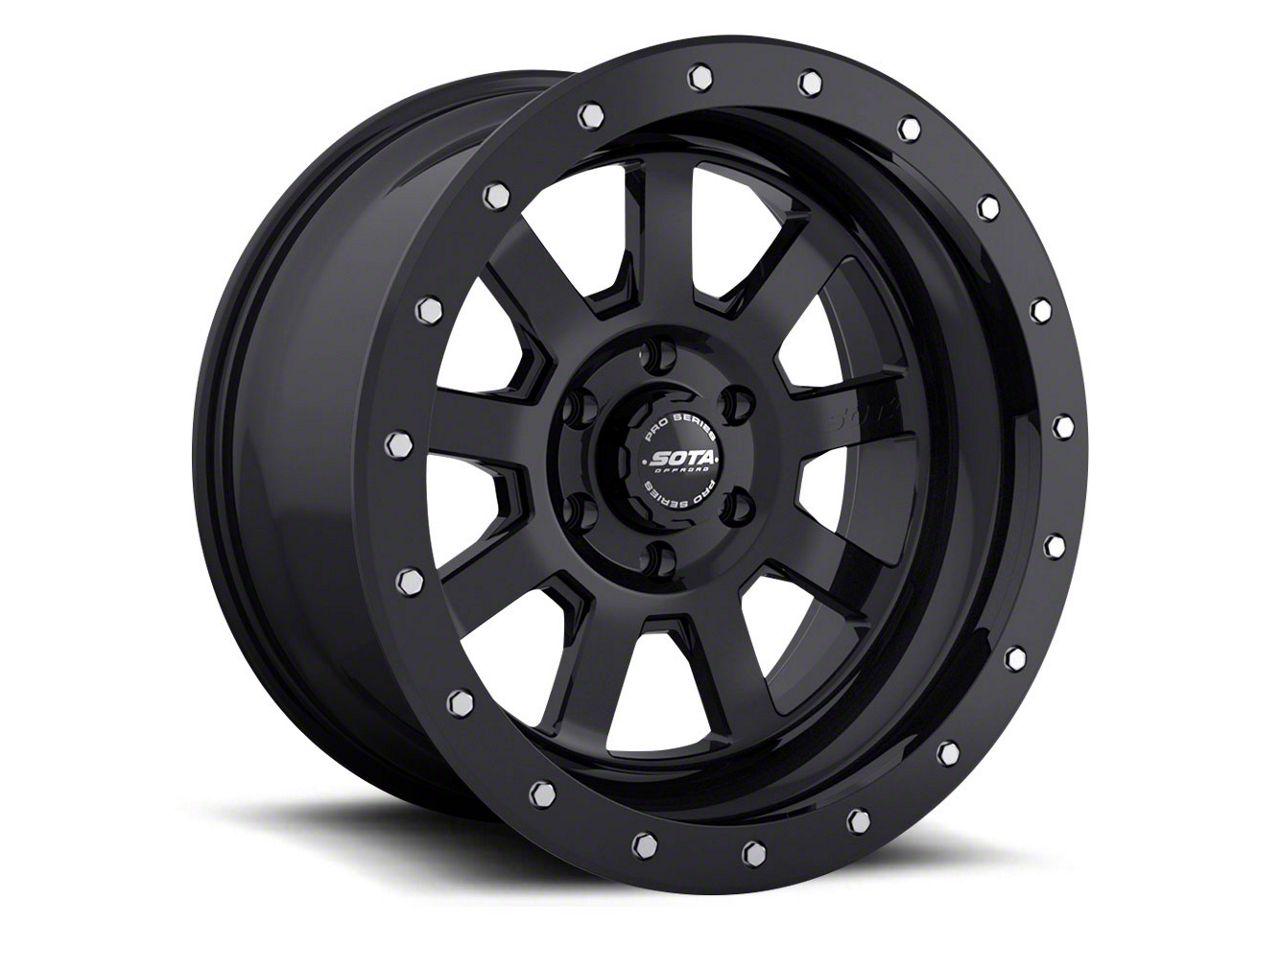 SOTA Off Road S.S.D Stealth Black 8-Lug Wheel - 20x10 (06-08 RAM 1500 Mega Cab)